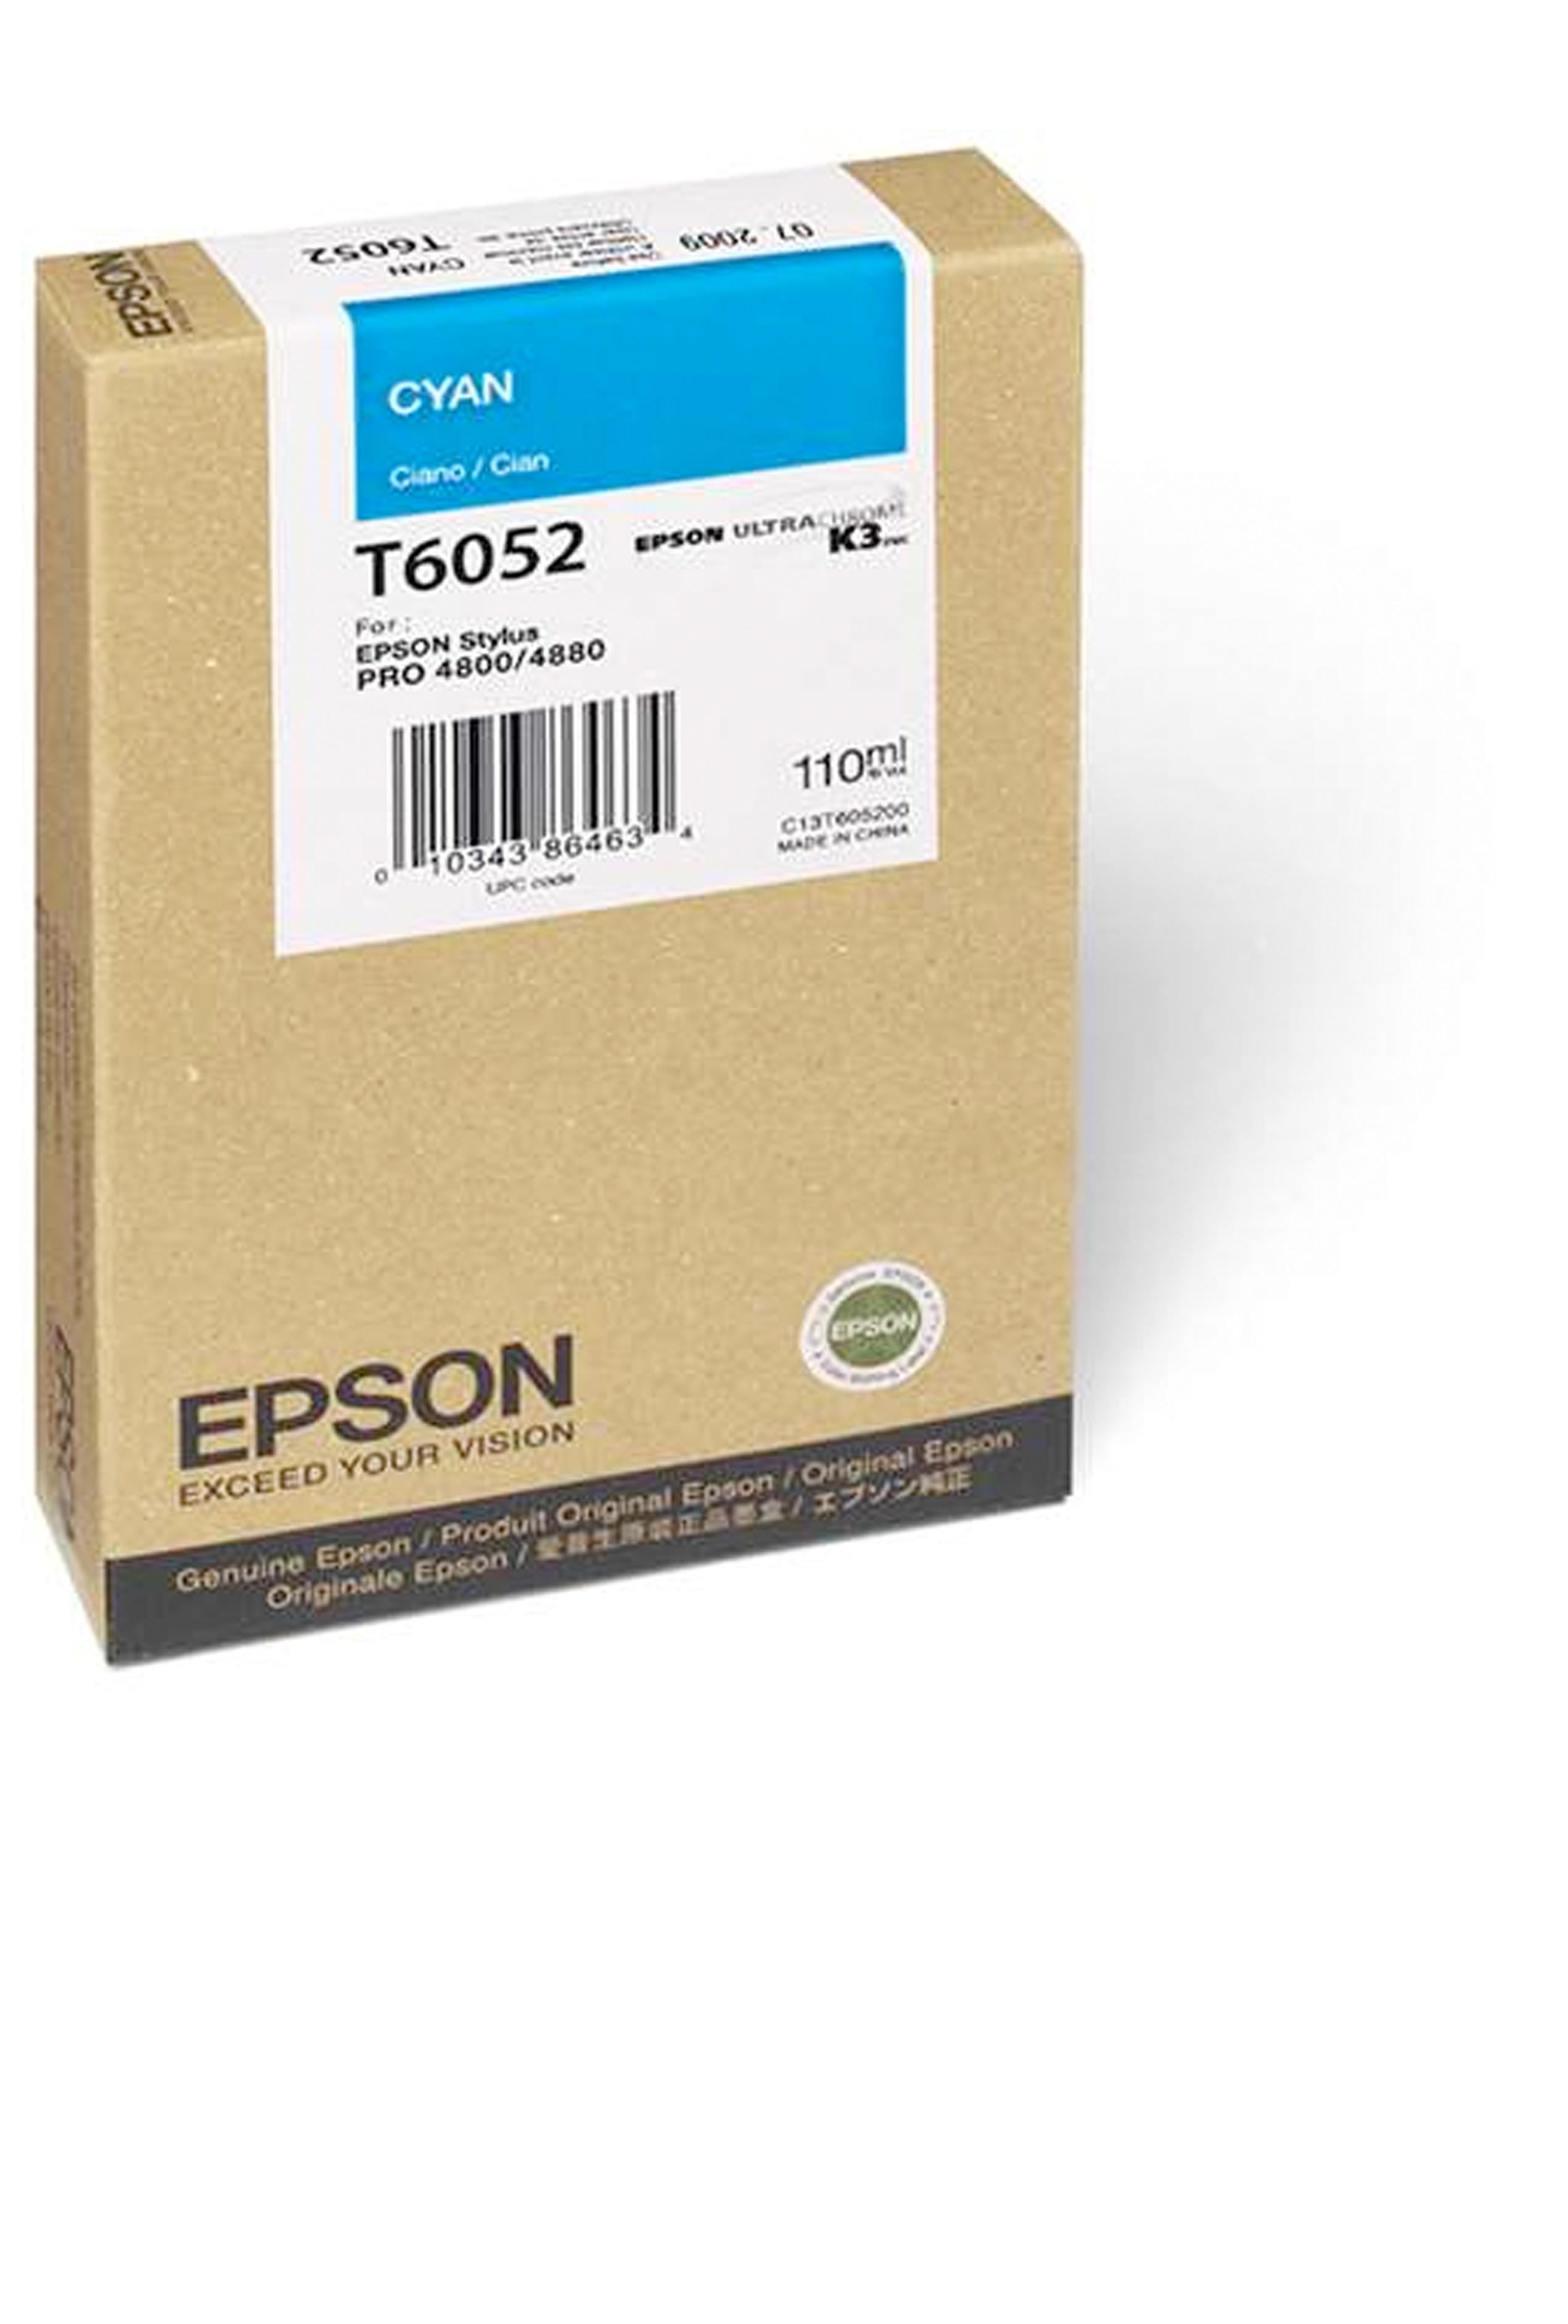 Epson EPSON SD CYAN INK (110 ML) (T605200)